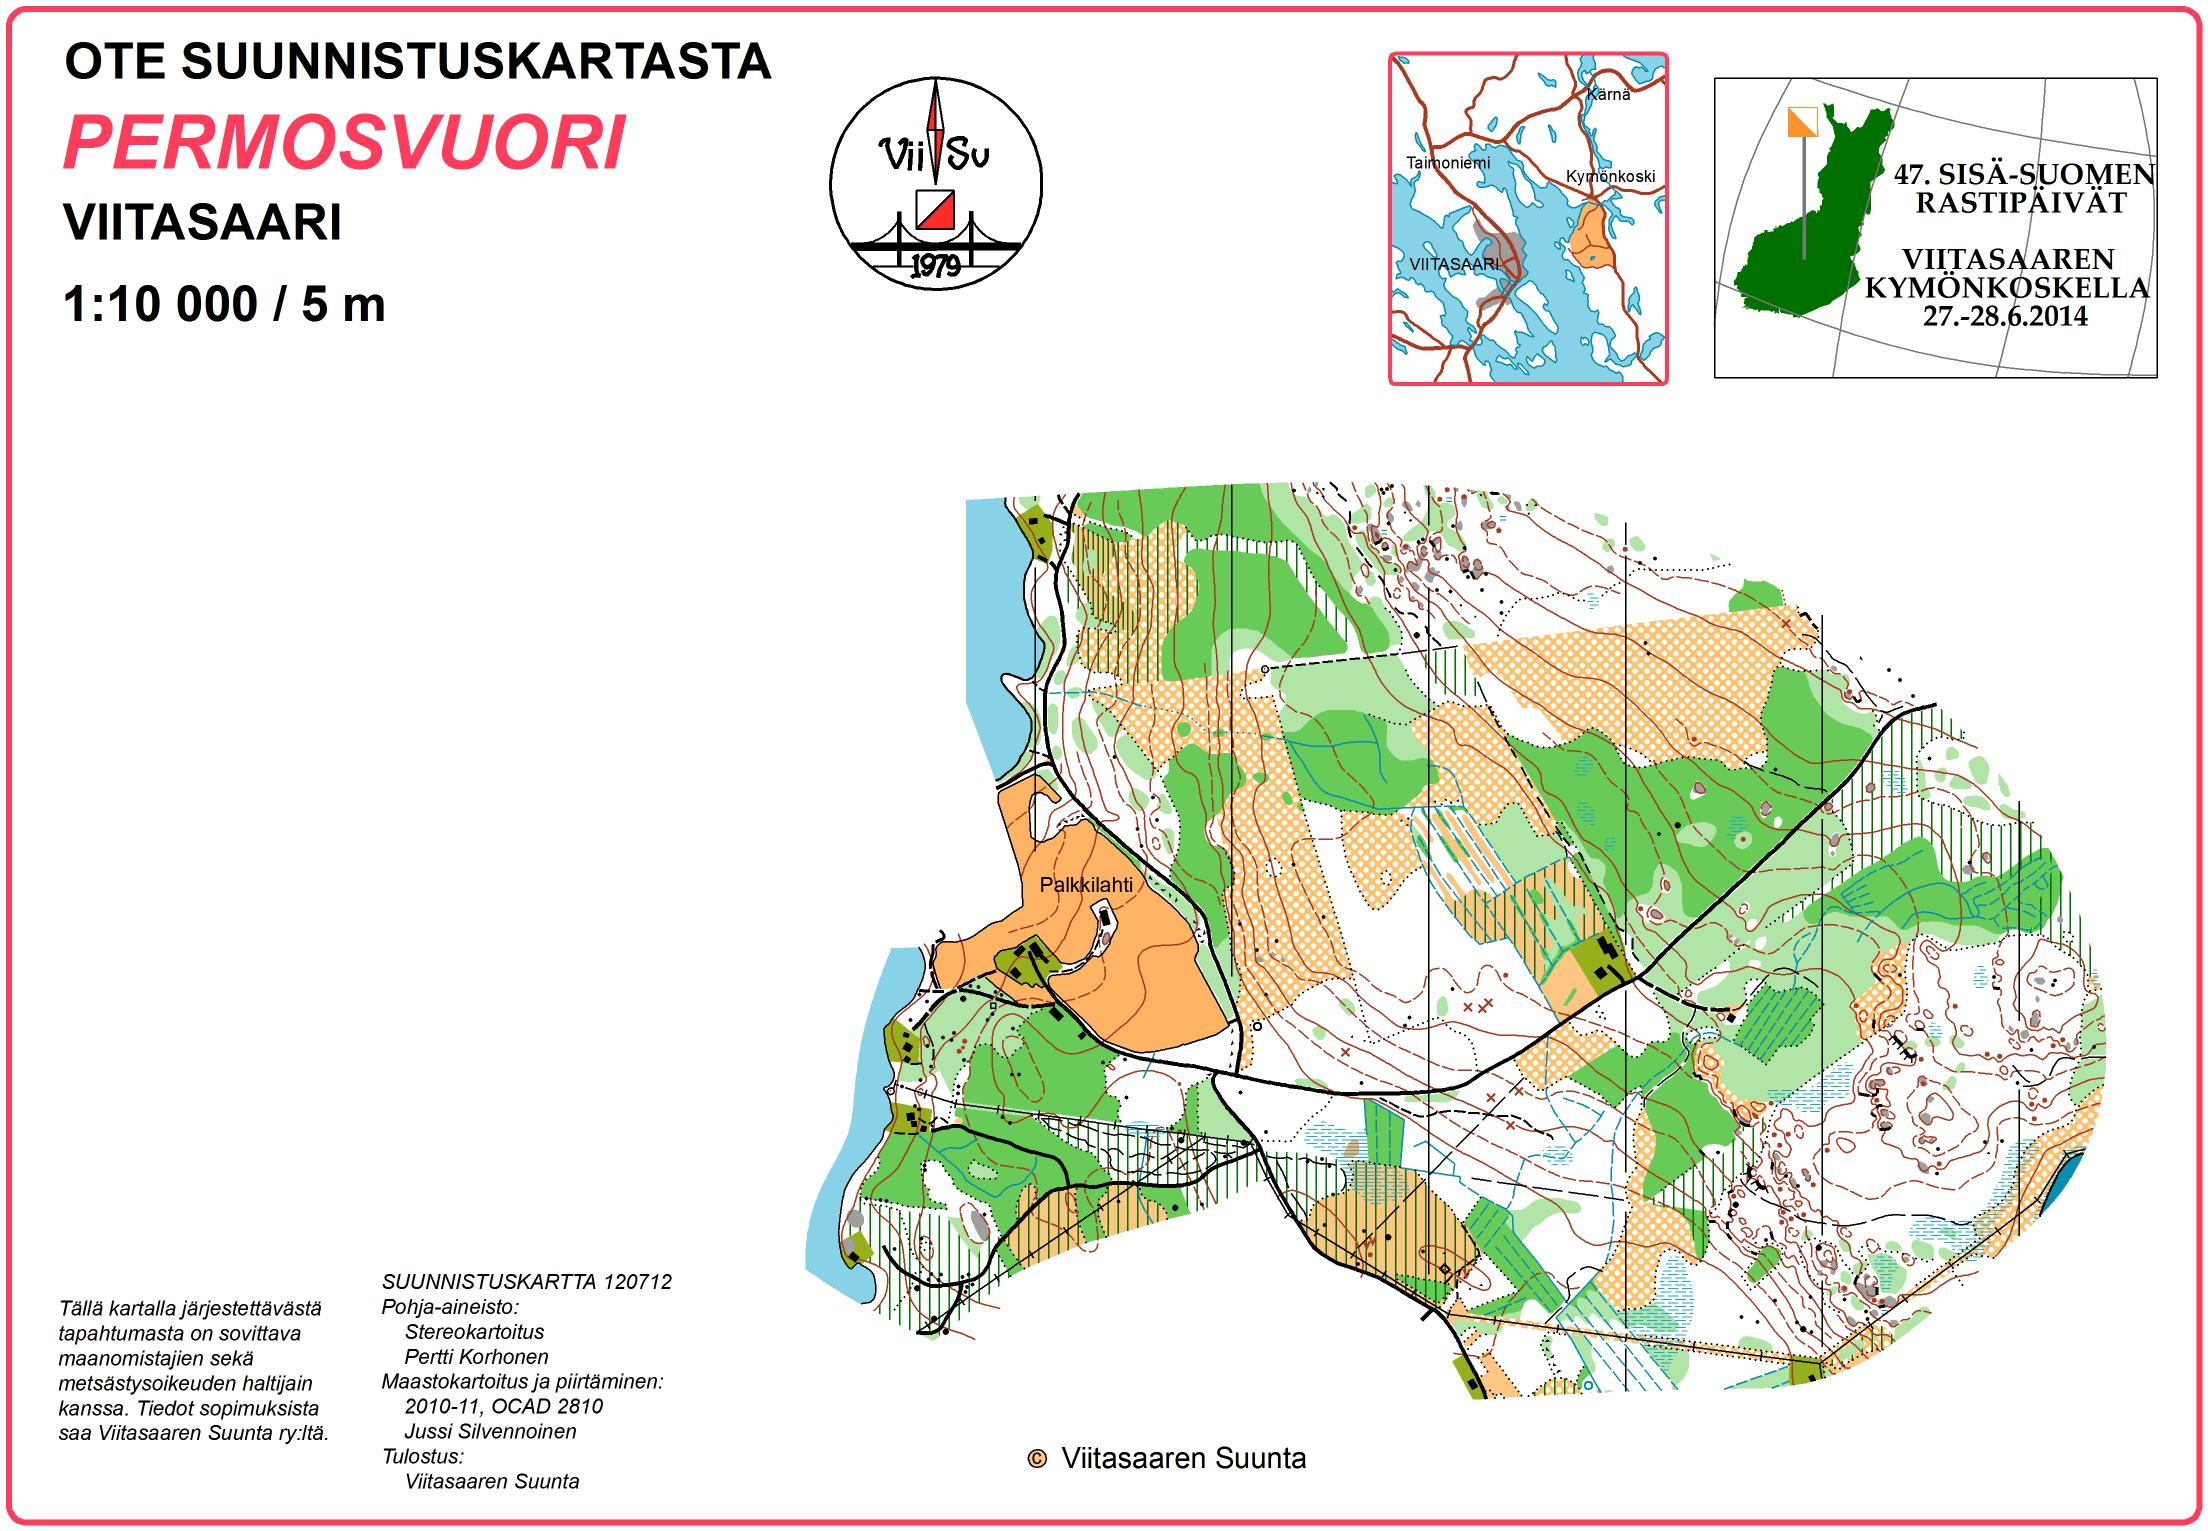 2014 06 27 Sisa Suomen Rastipaivat Pe Lasten Suorat